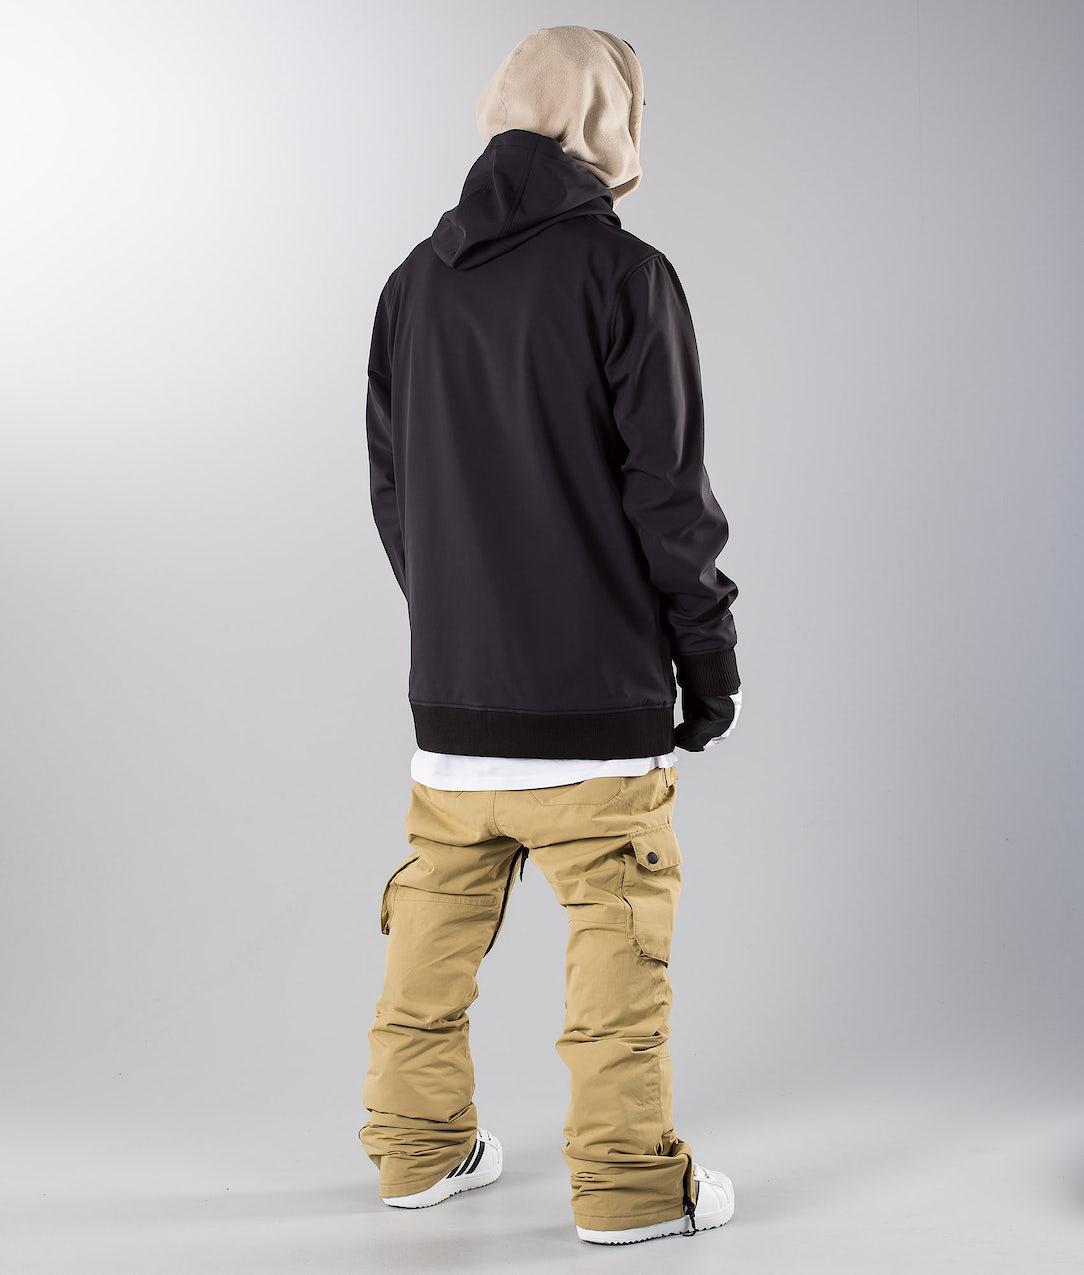 Toppen Dope Yeti Snowboard Jacket Black - Ridestore.com AC-86